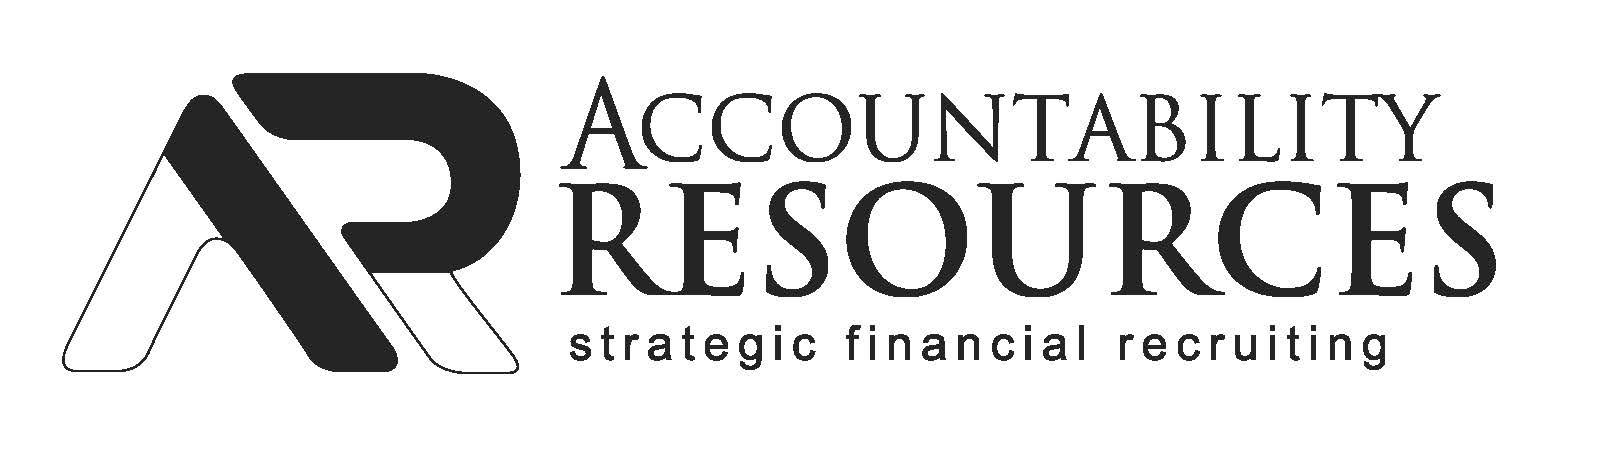 Accountability Resources_logo_B&W.jpg